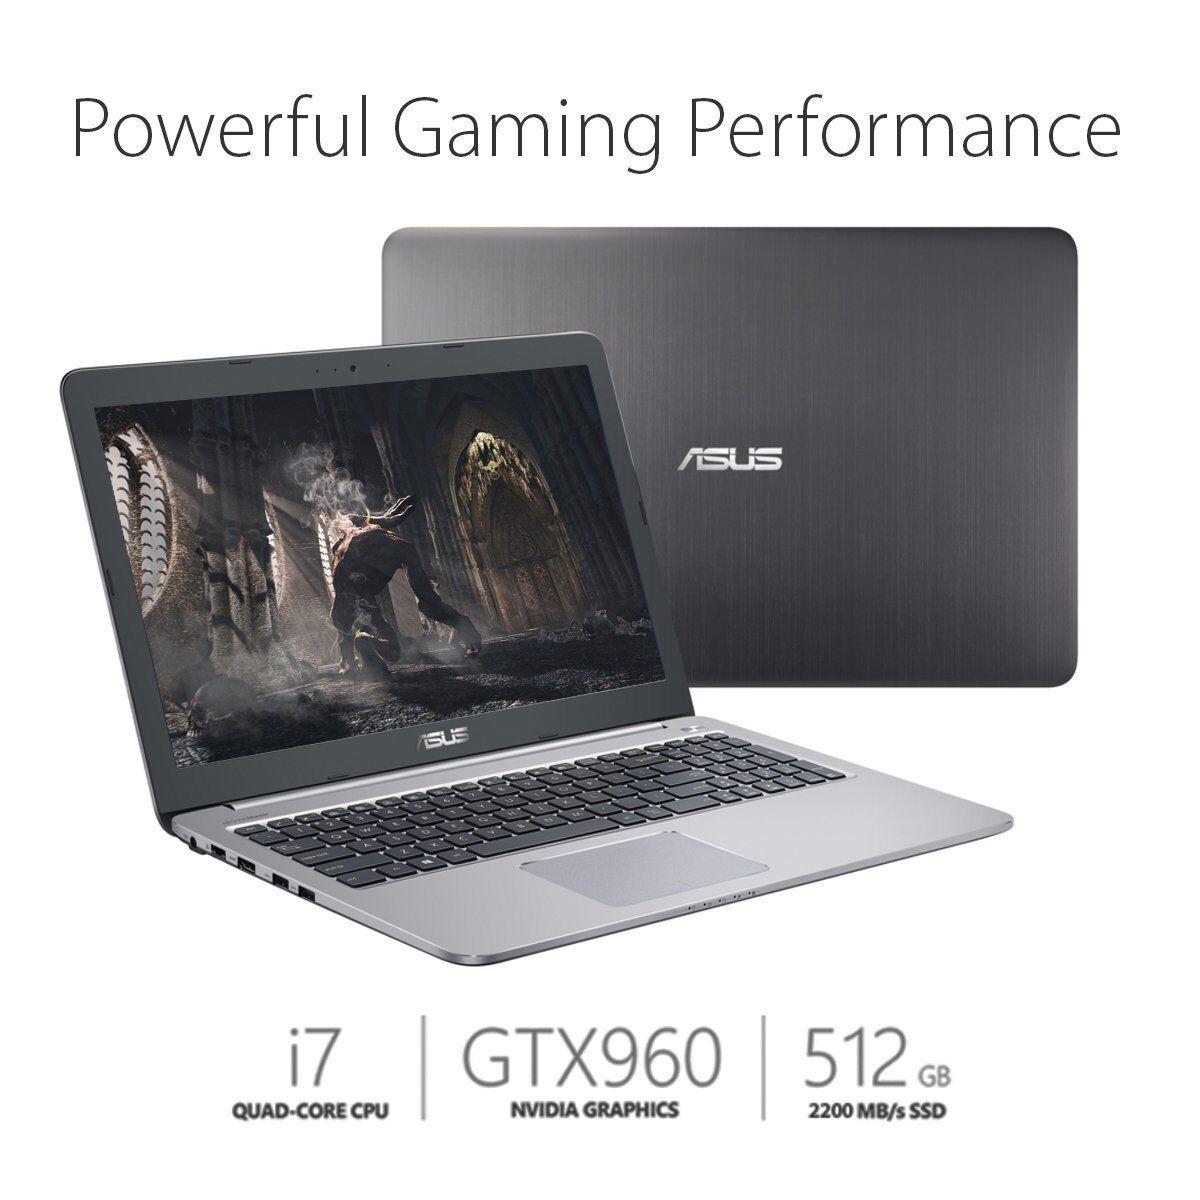 "ASUS K501UW-AB78 15.6"" Full HD Gaming Laptop GTX 960M, 512GB SSD i7"